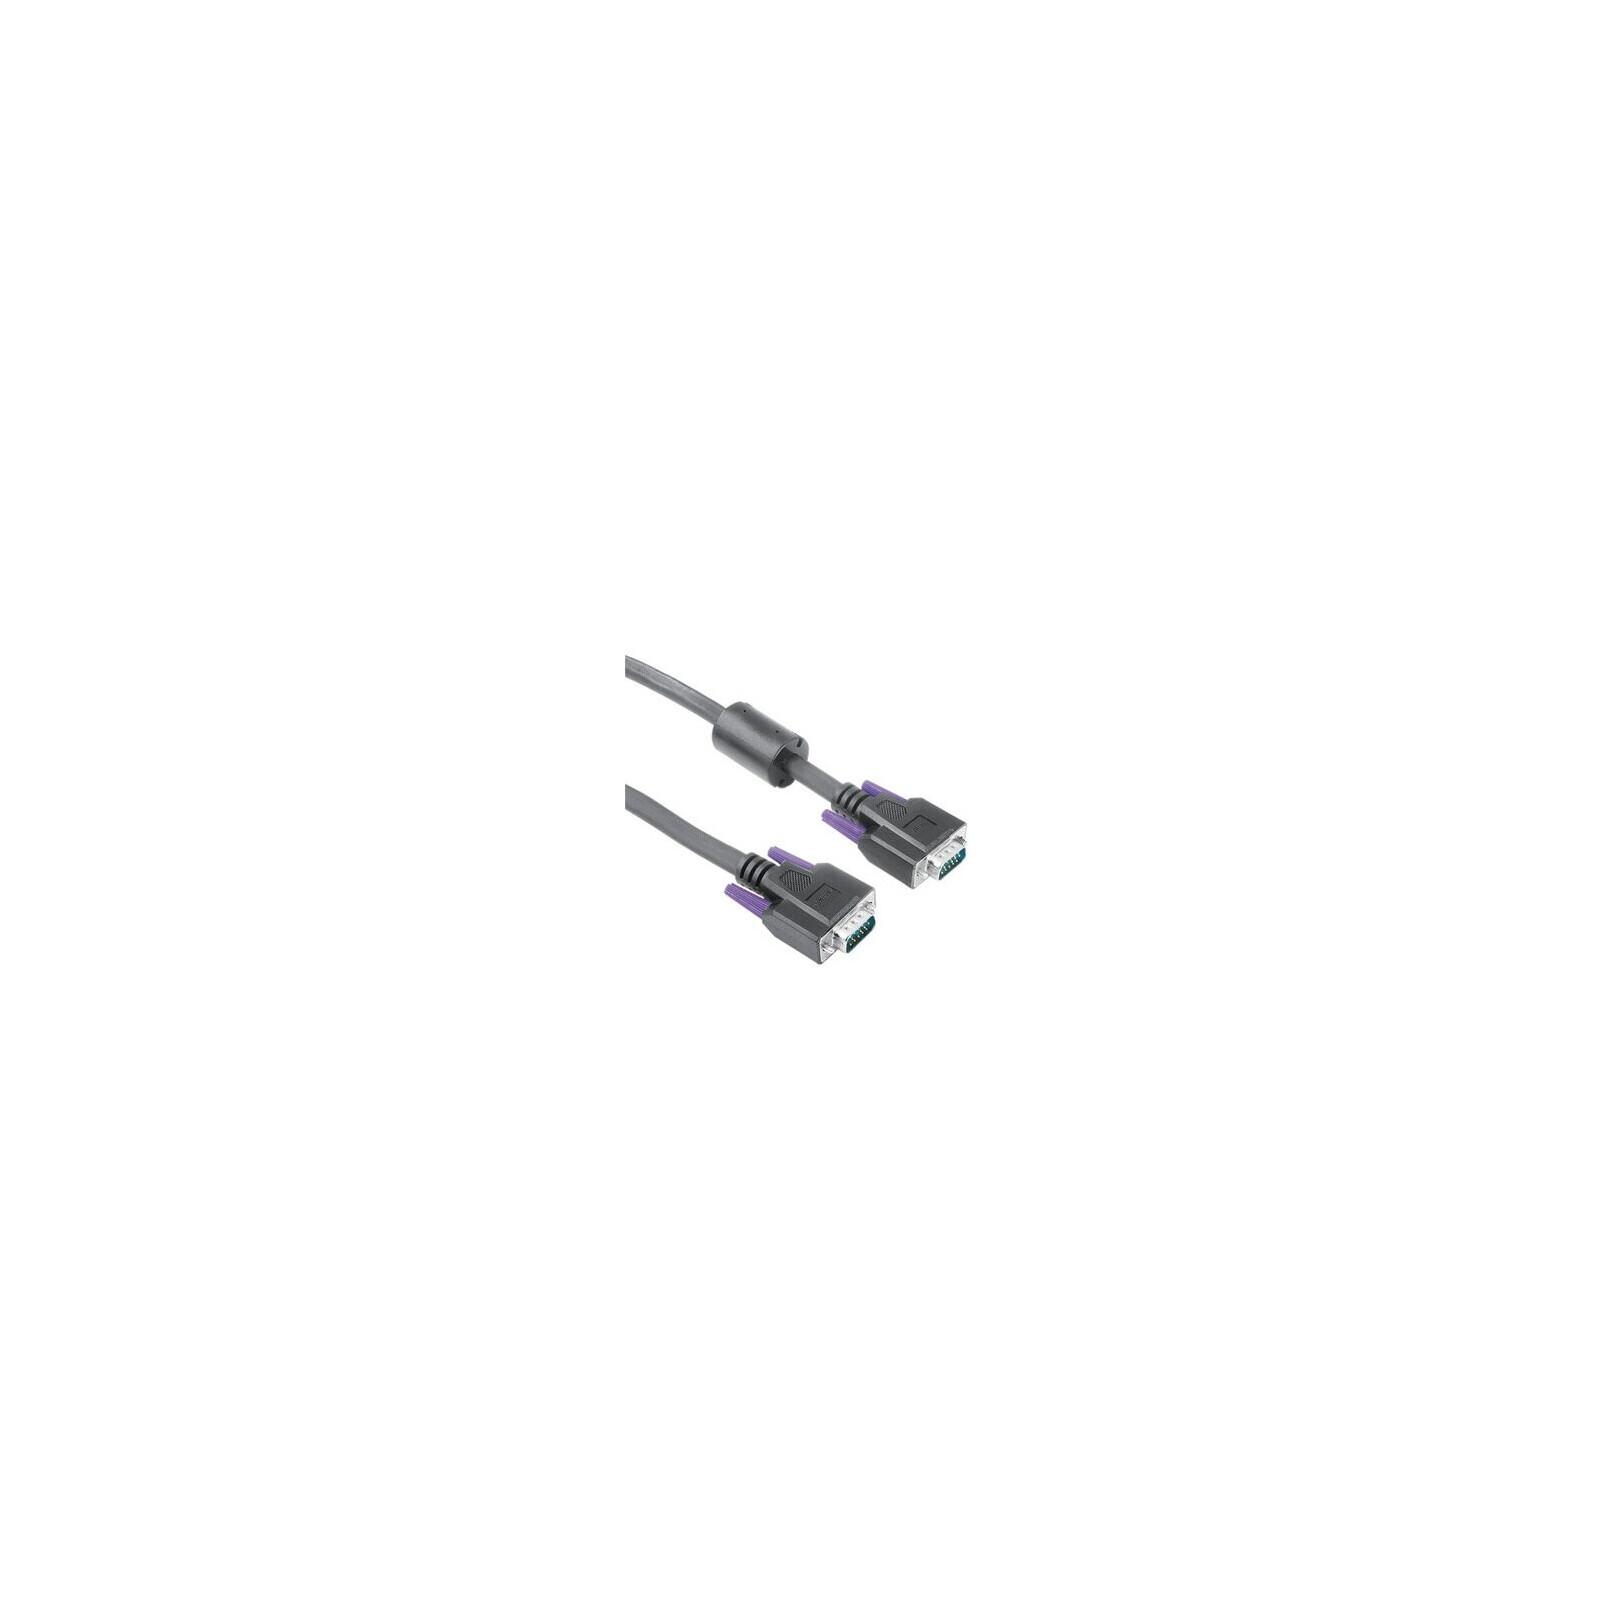 Hama 41933 VGA-Kabel, Ferritkern, doppelt geschirmt, 1,80 m